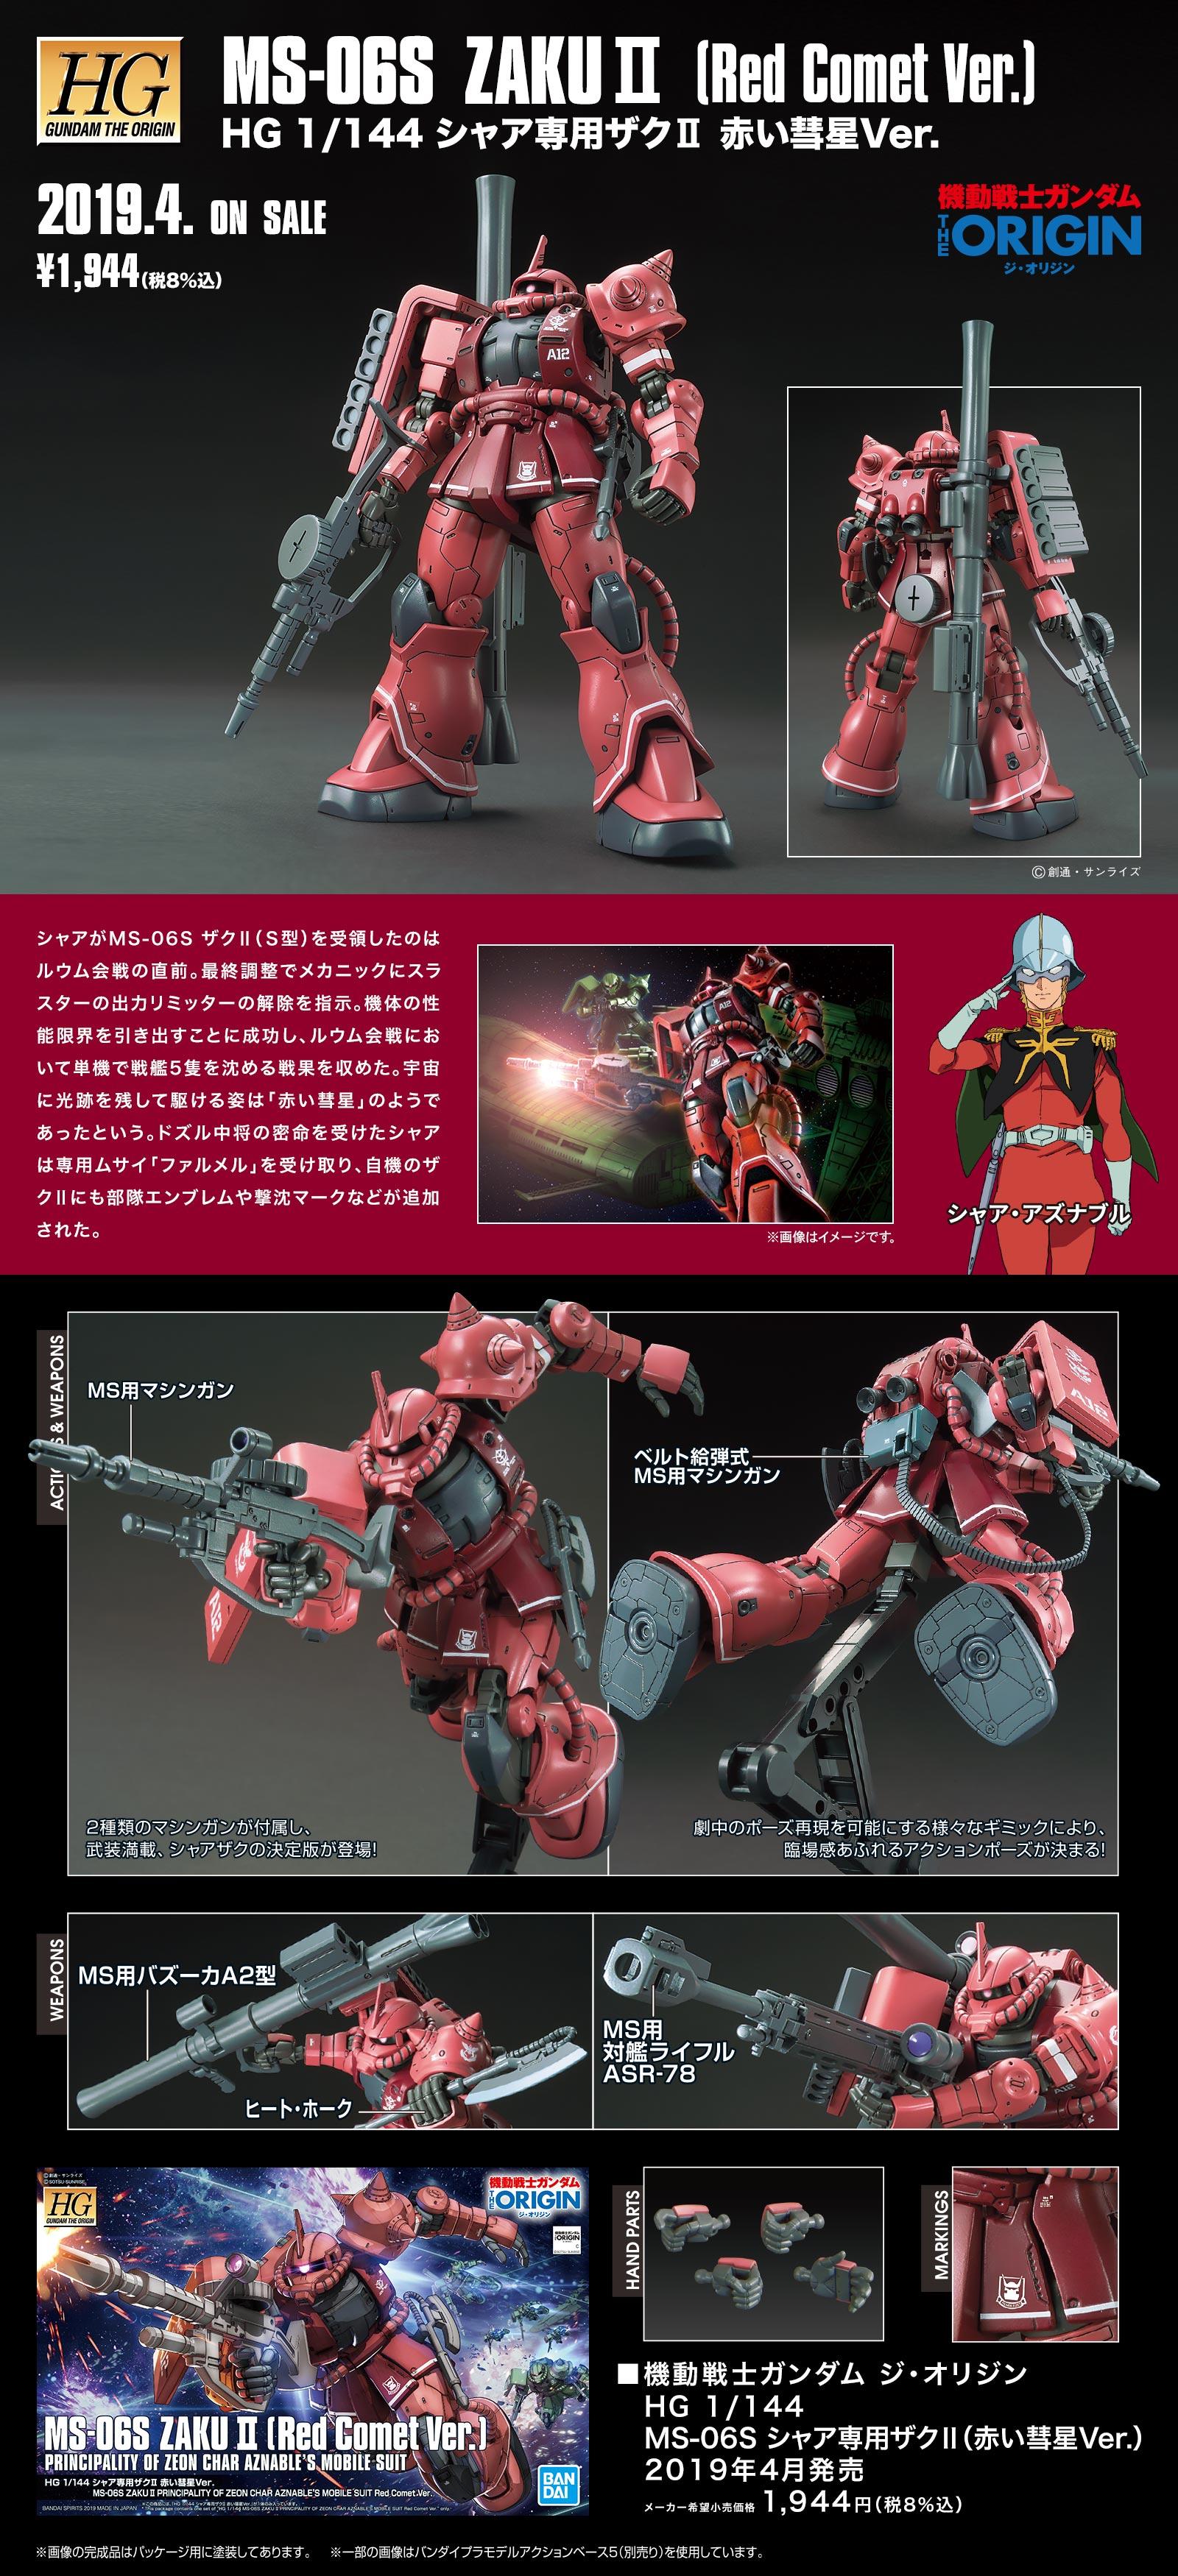 HG 1/144 シャア専用ザクII 赤い彗星Ver. 公式商品説明(画像)